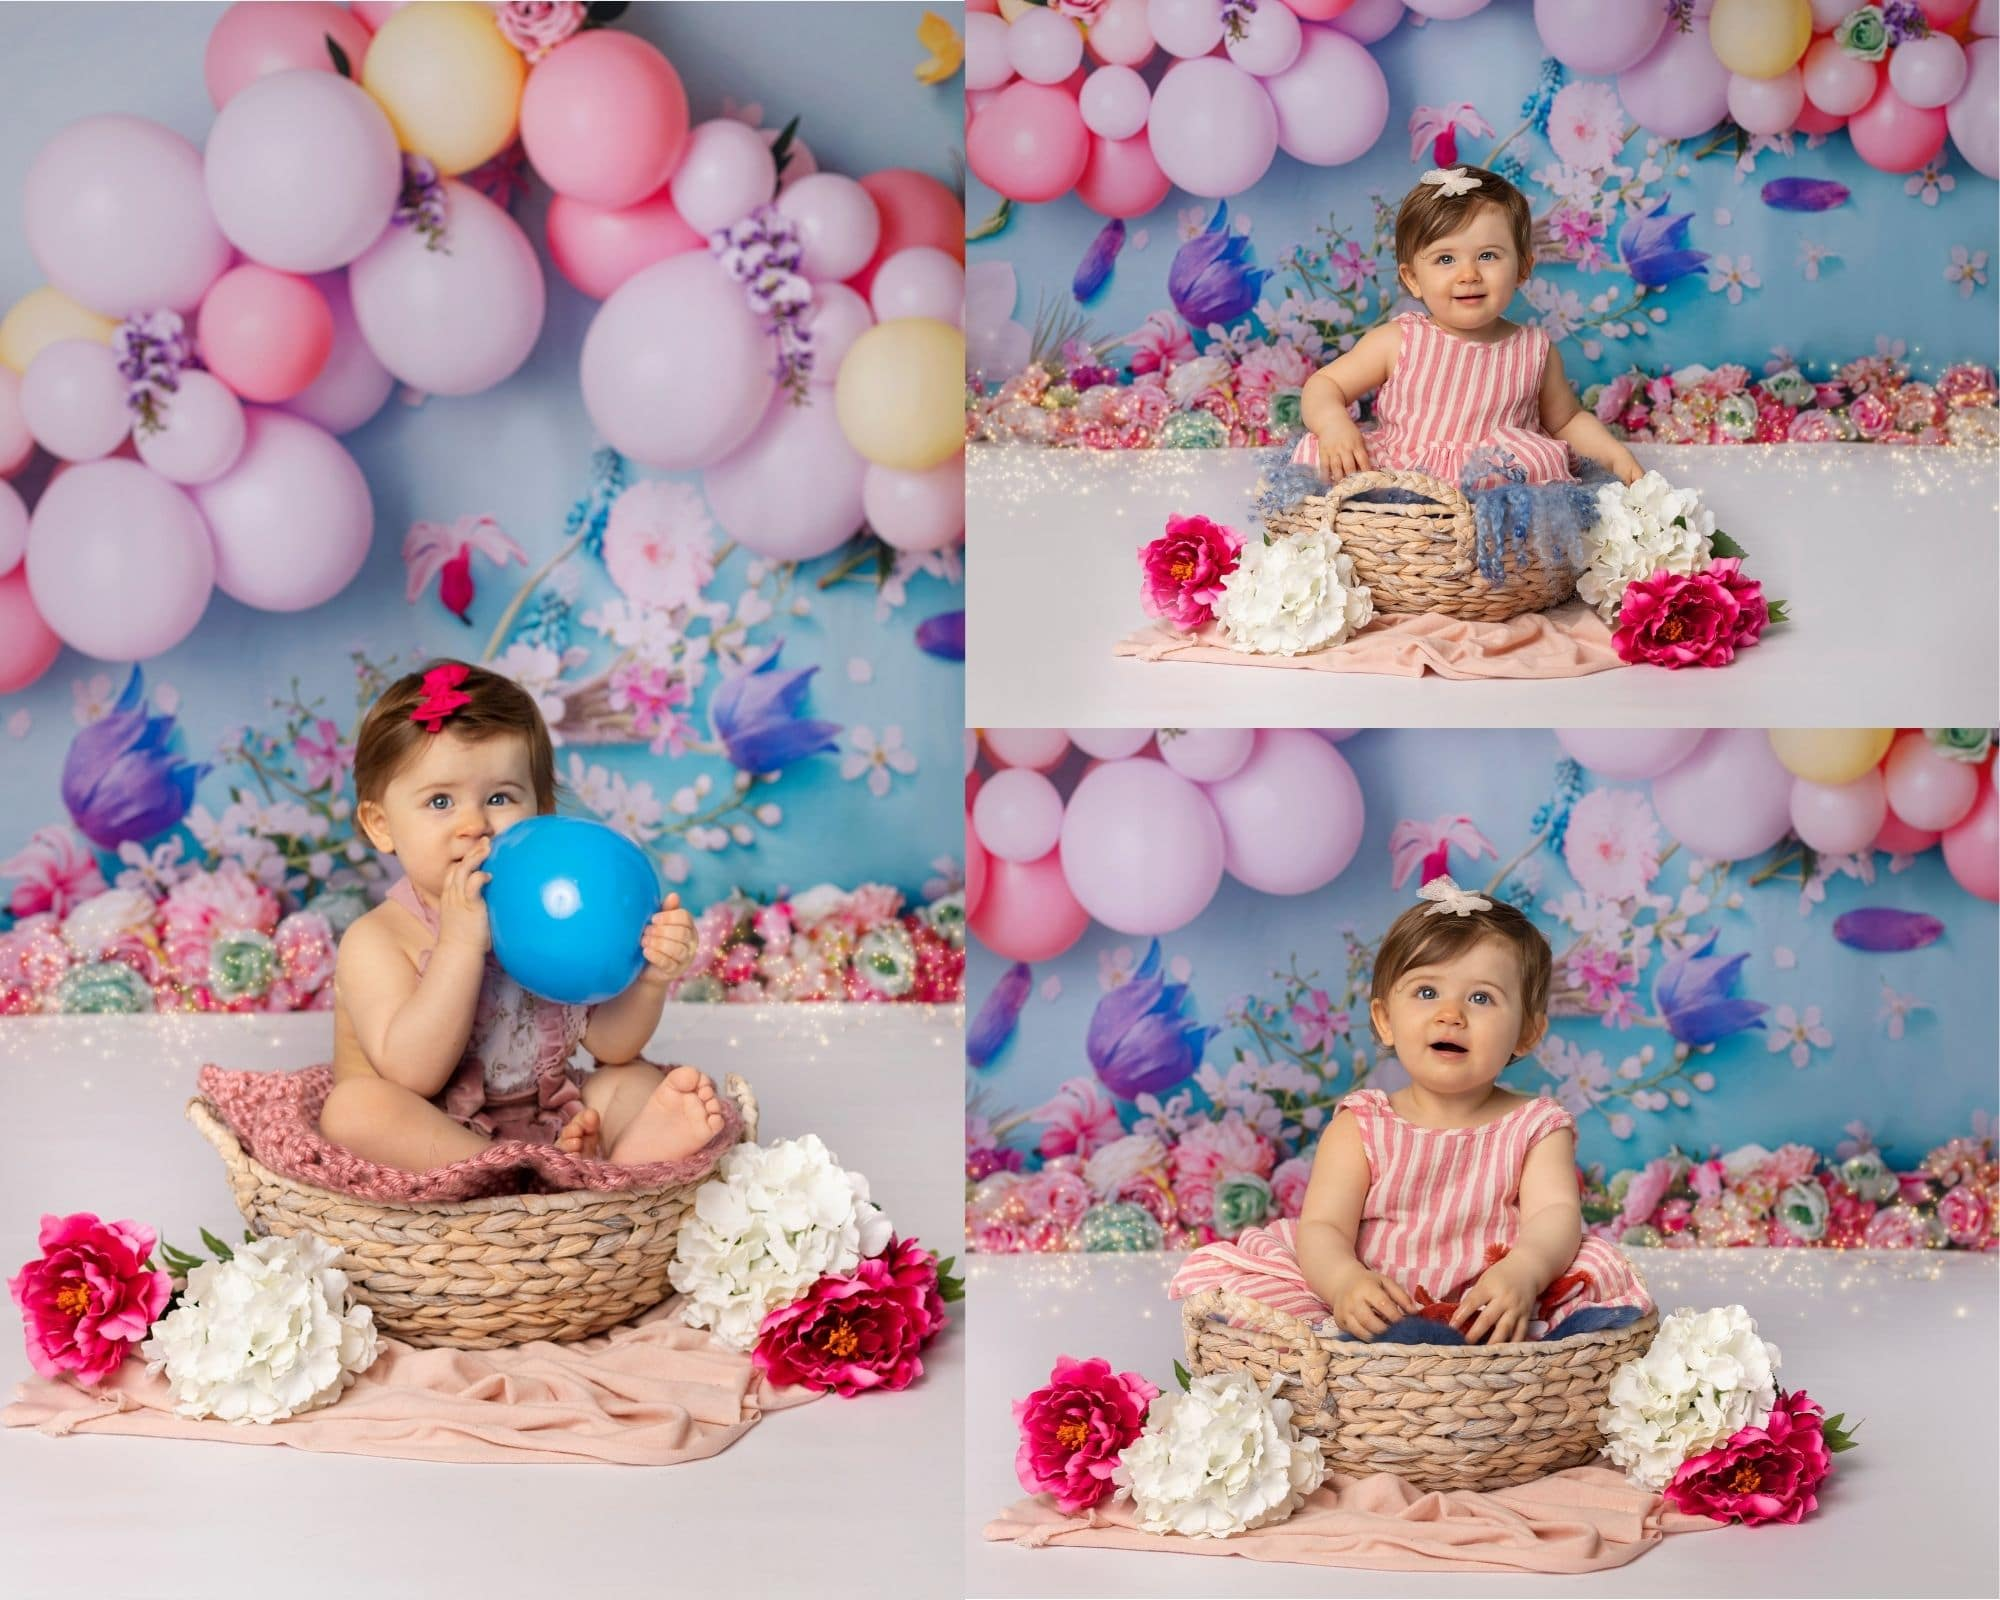 photographe-bebe-seance-smas-the-cake-strasbourg-clover-photographies-1